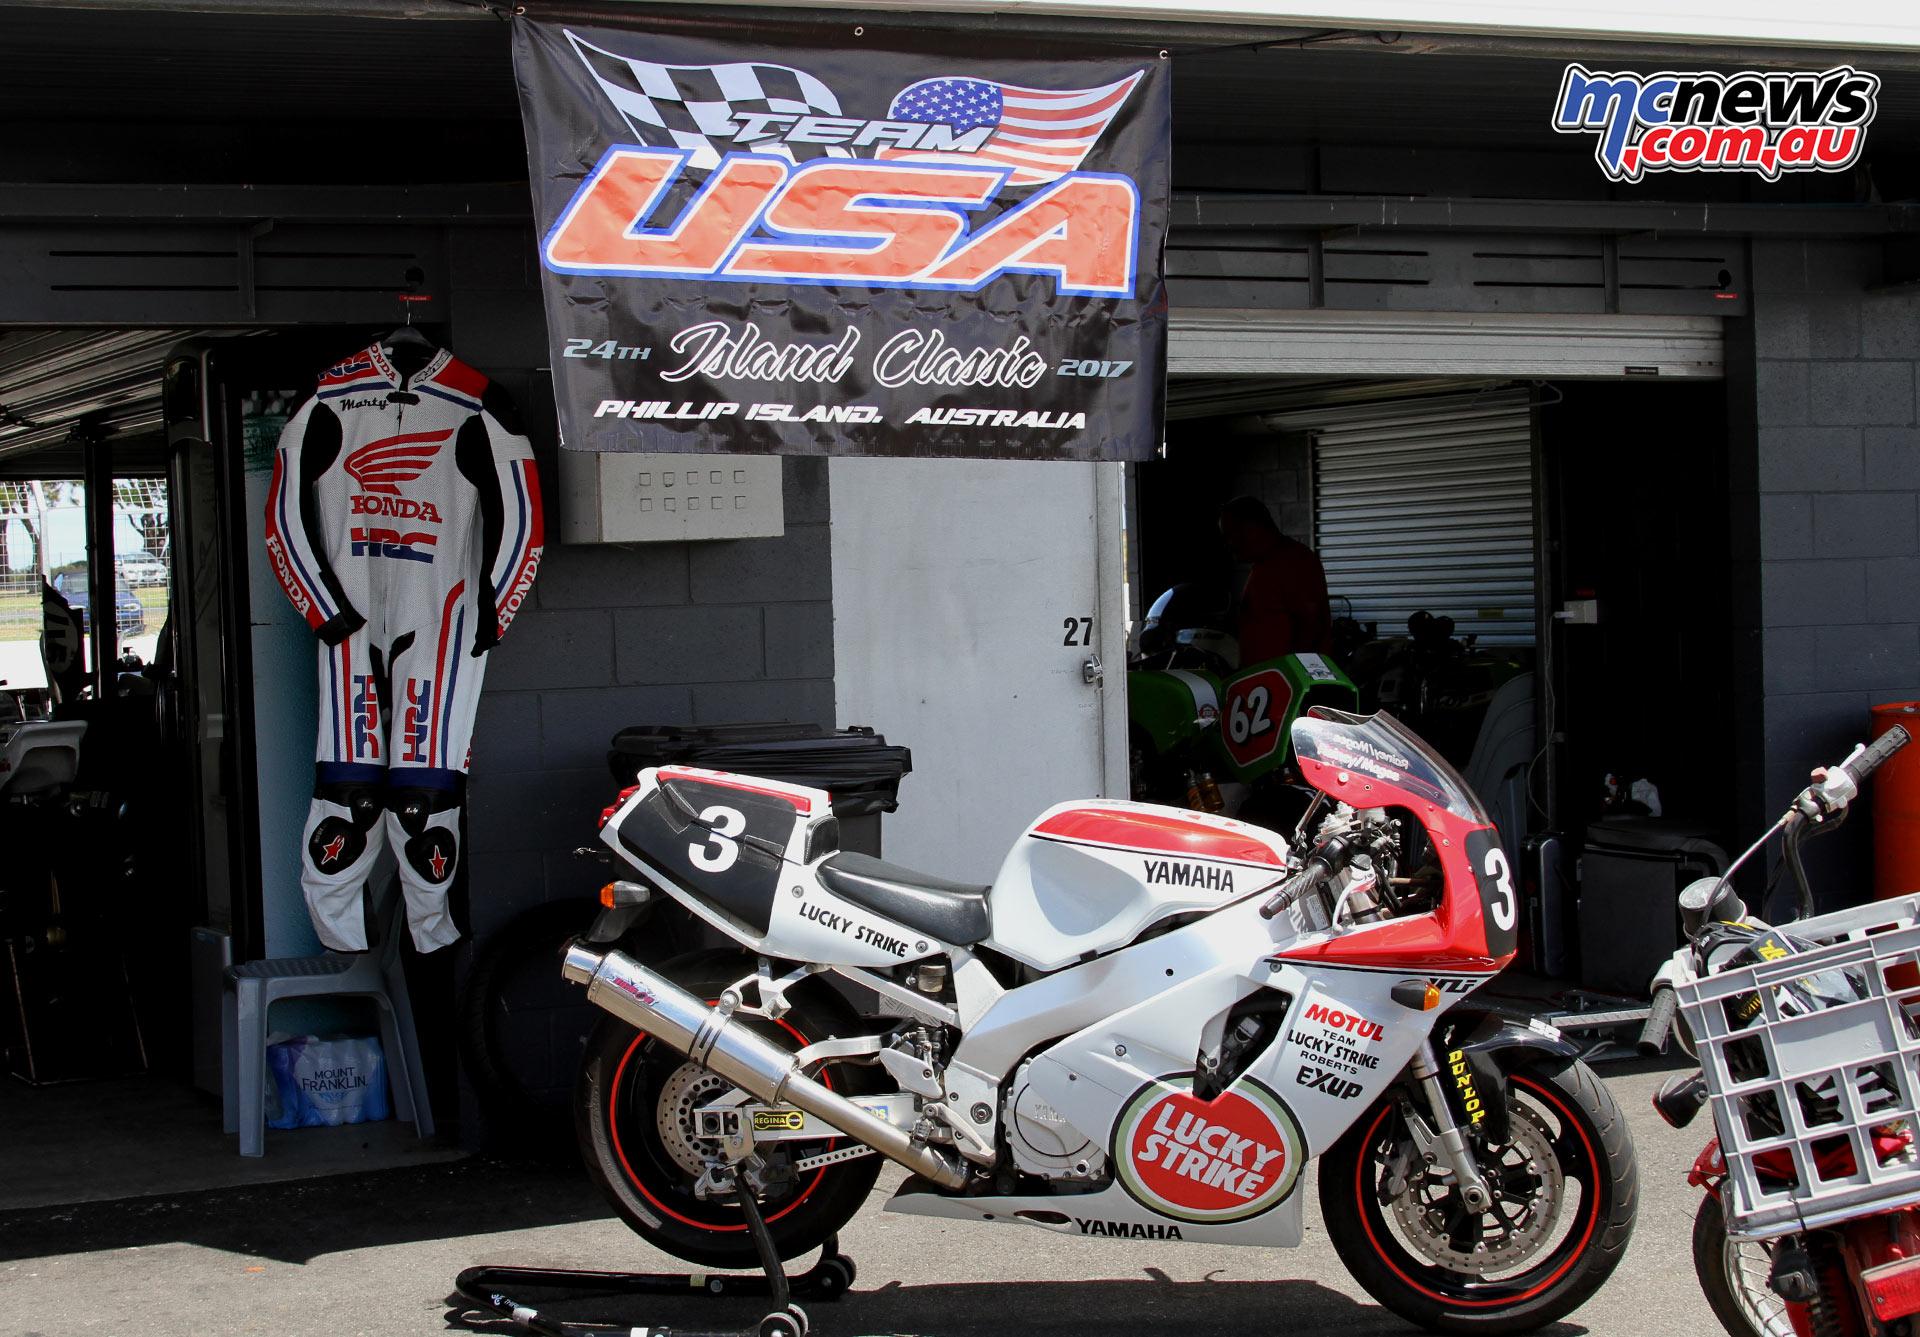 2017 Island Classic - Team USA pit garage